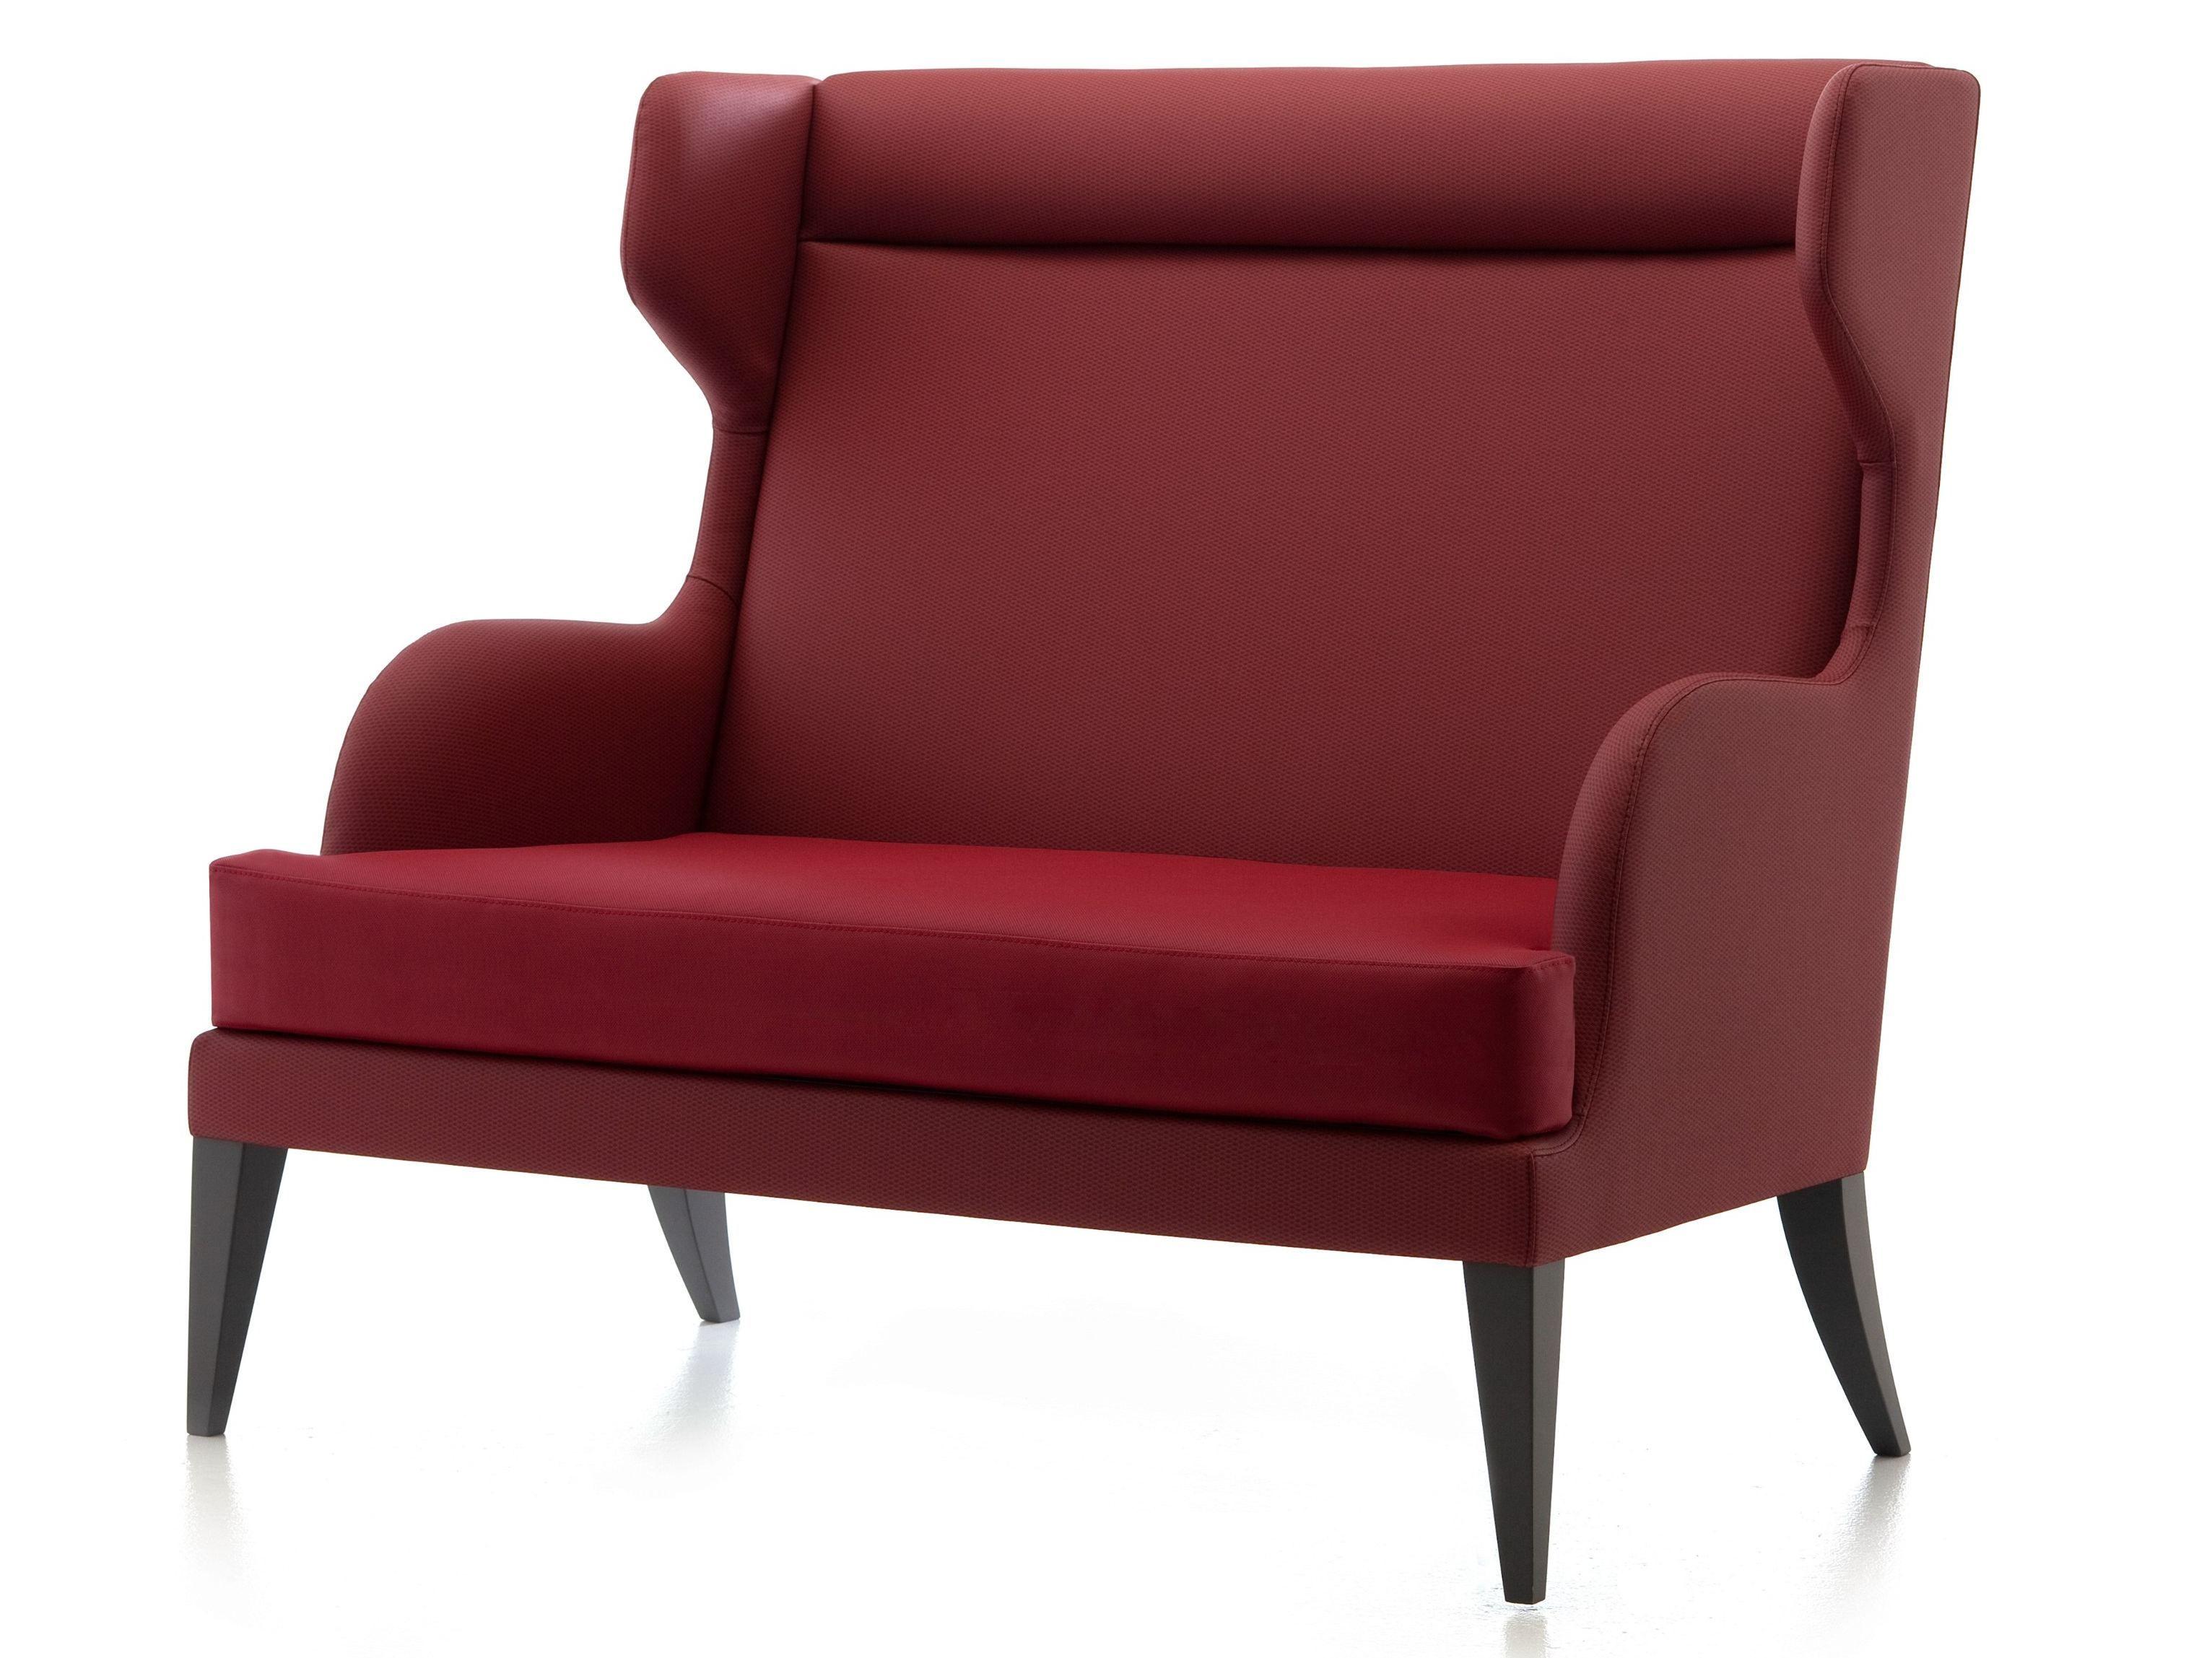 2 er sofa mit hoher r ckenlehne kollektion onda by very. Black Bedroom Furniture Sets. Home Design Ideas